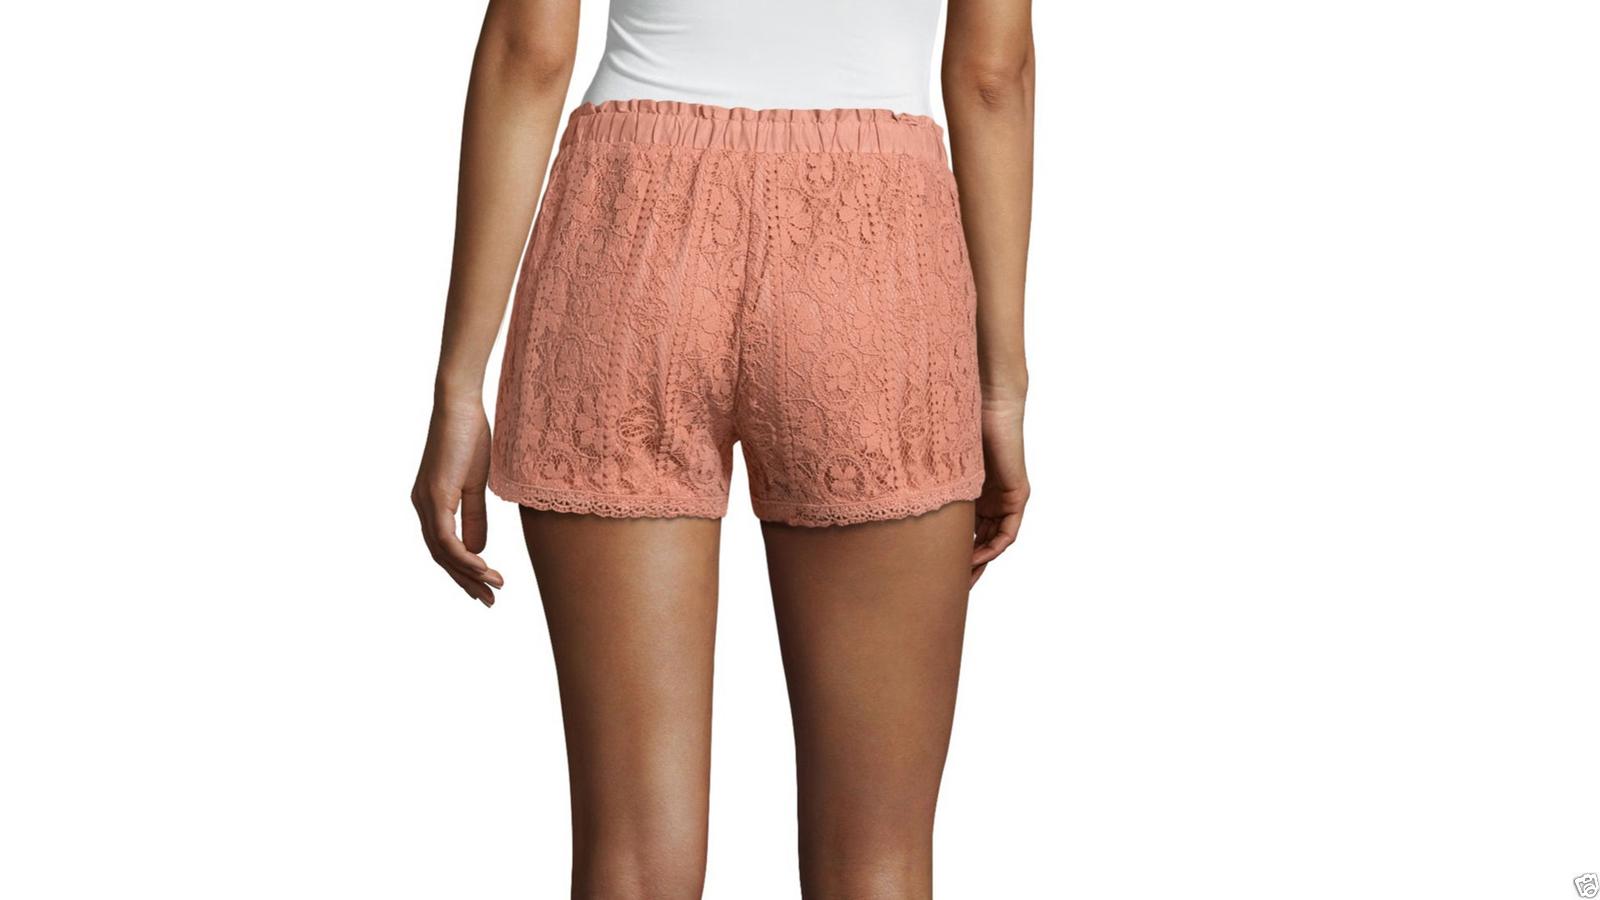 "Rewind 3"" Lace Soft Shorts Juniors Size S, M, L, XL New Msrp $40.00 Clay"